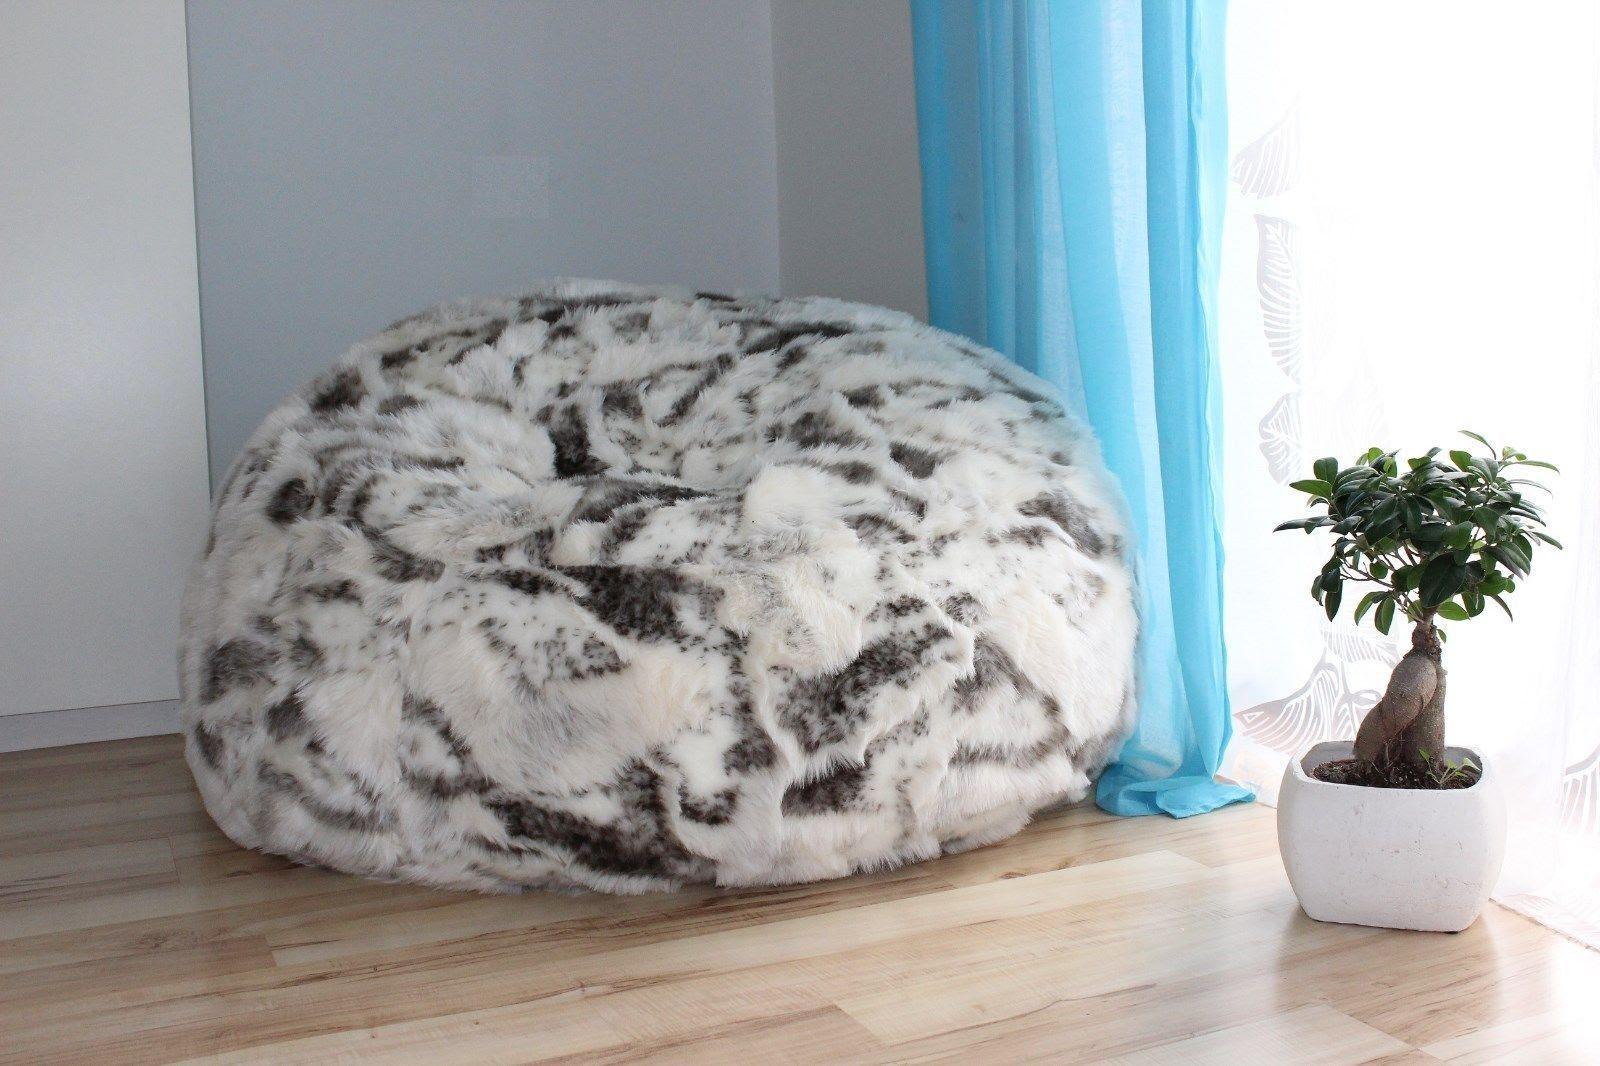 How to Make a Bean Bag Chair Cover | eBay